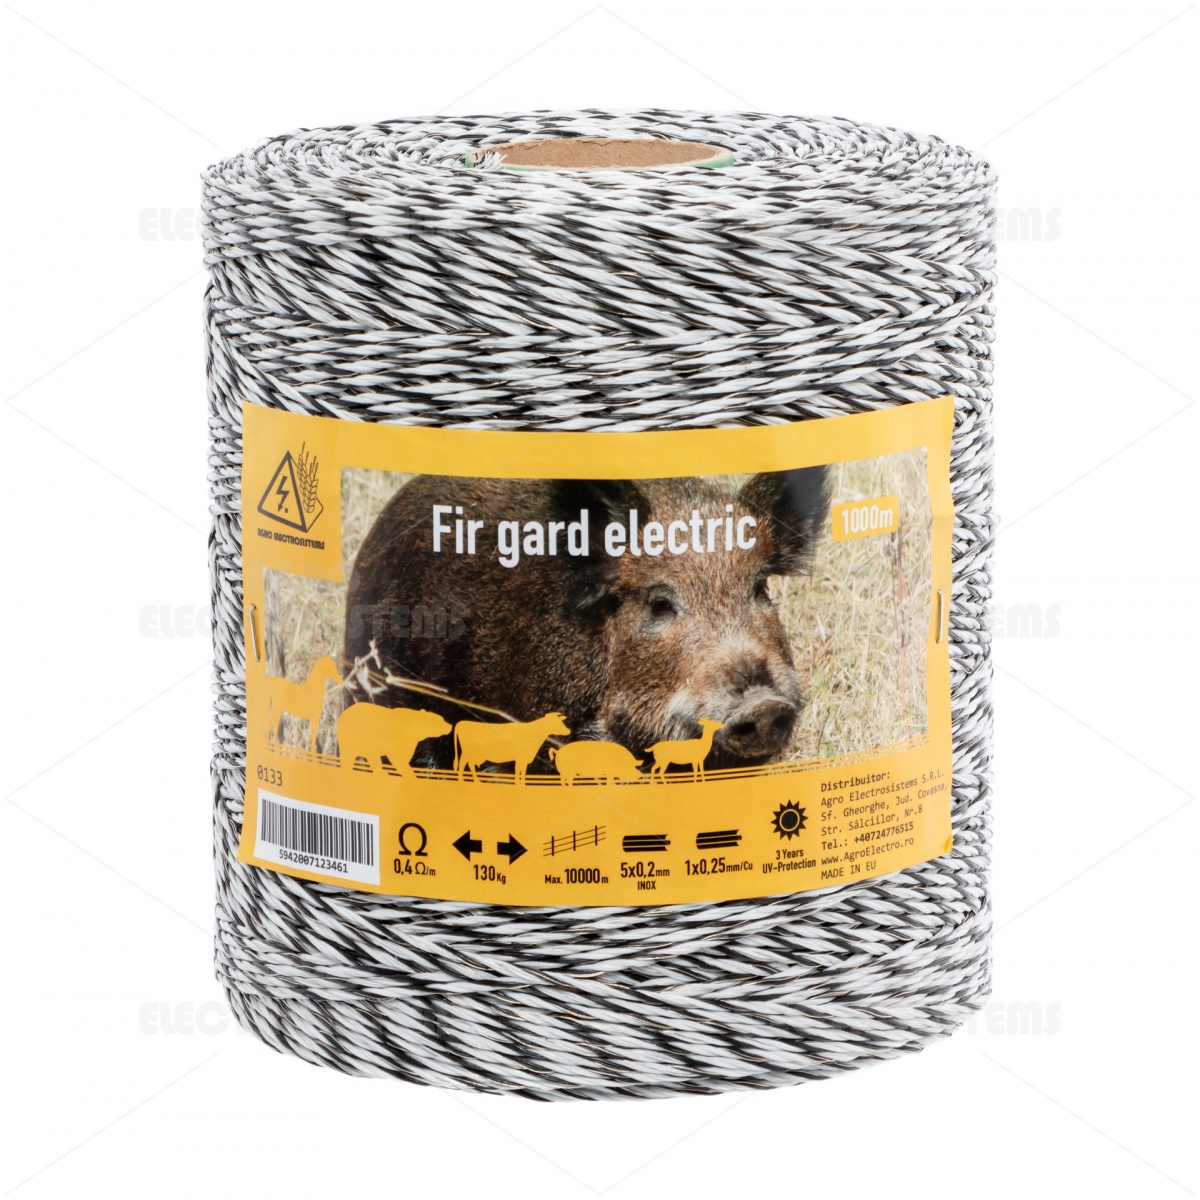 Pachet gard electric cu fir 1000m, pentru 6,25 sau 1,56 Ha